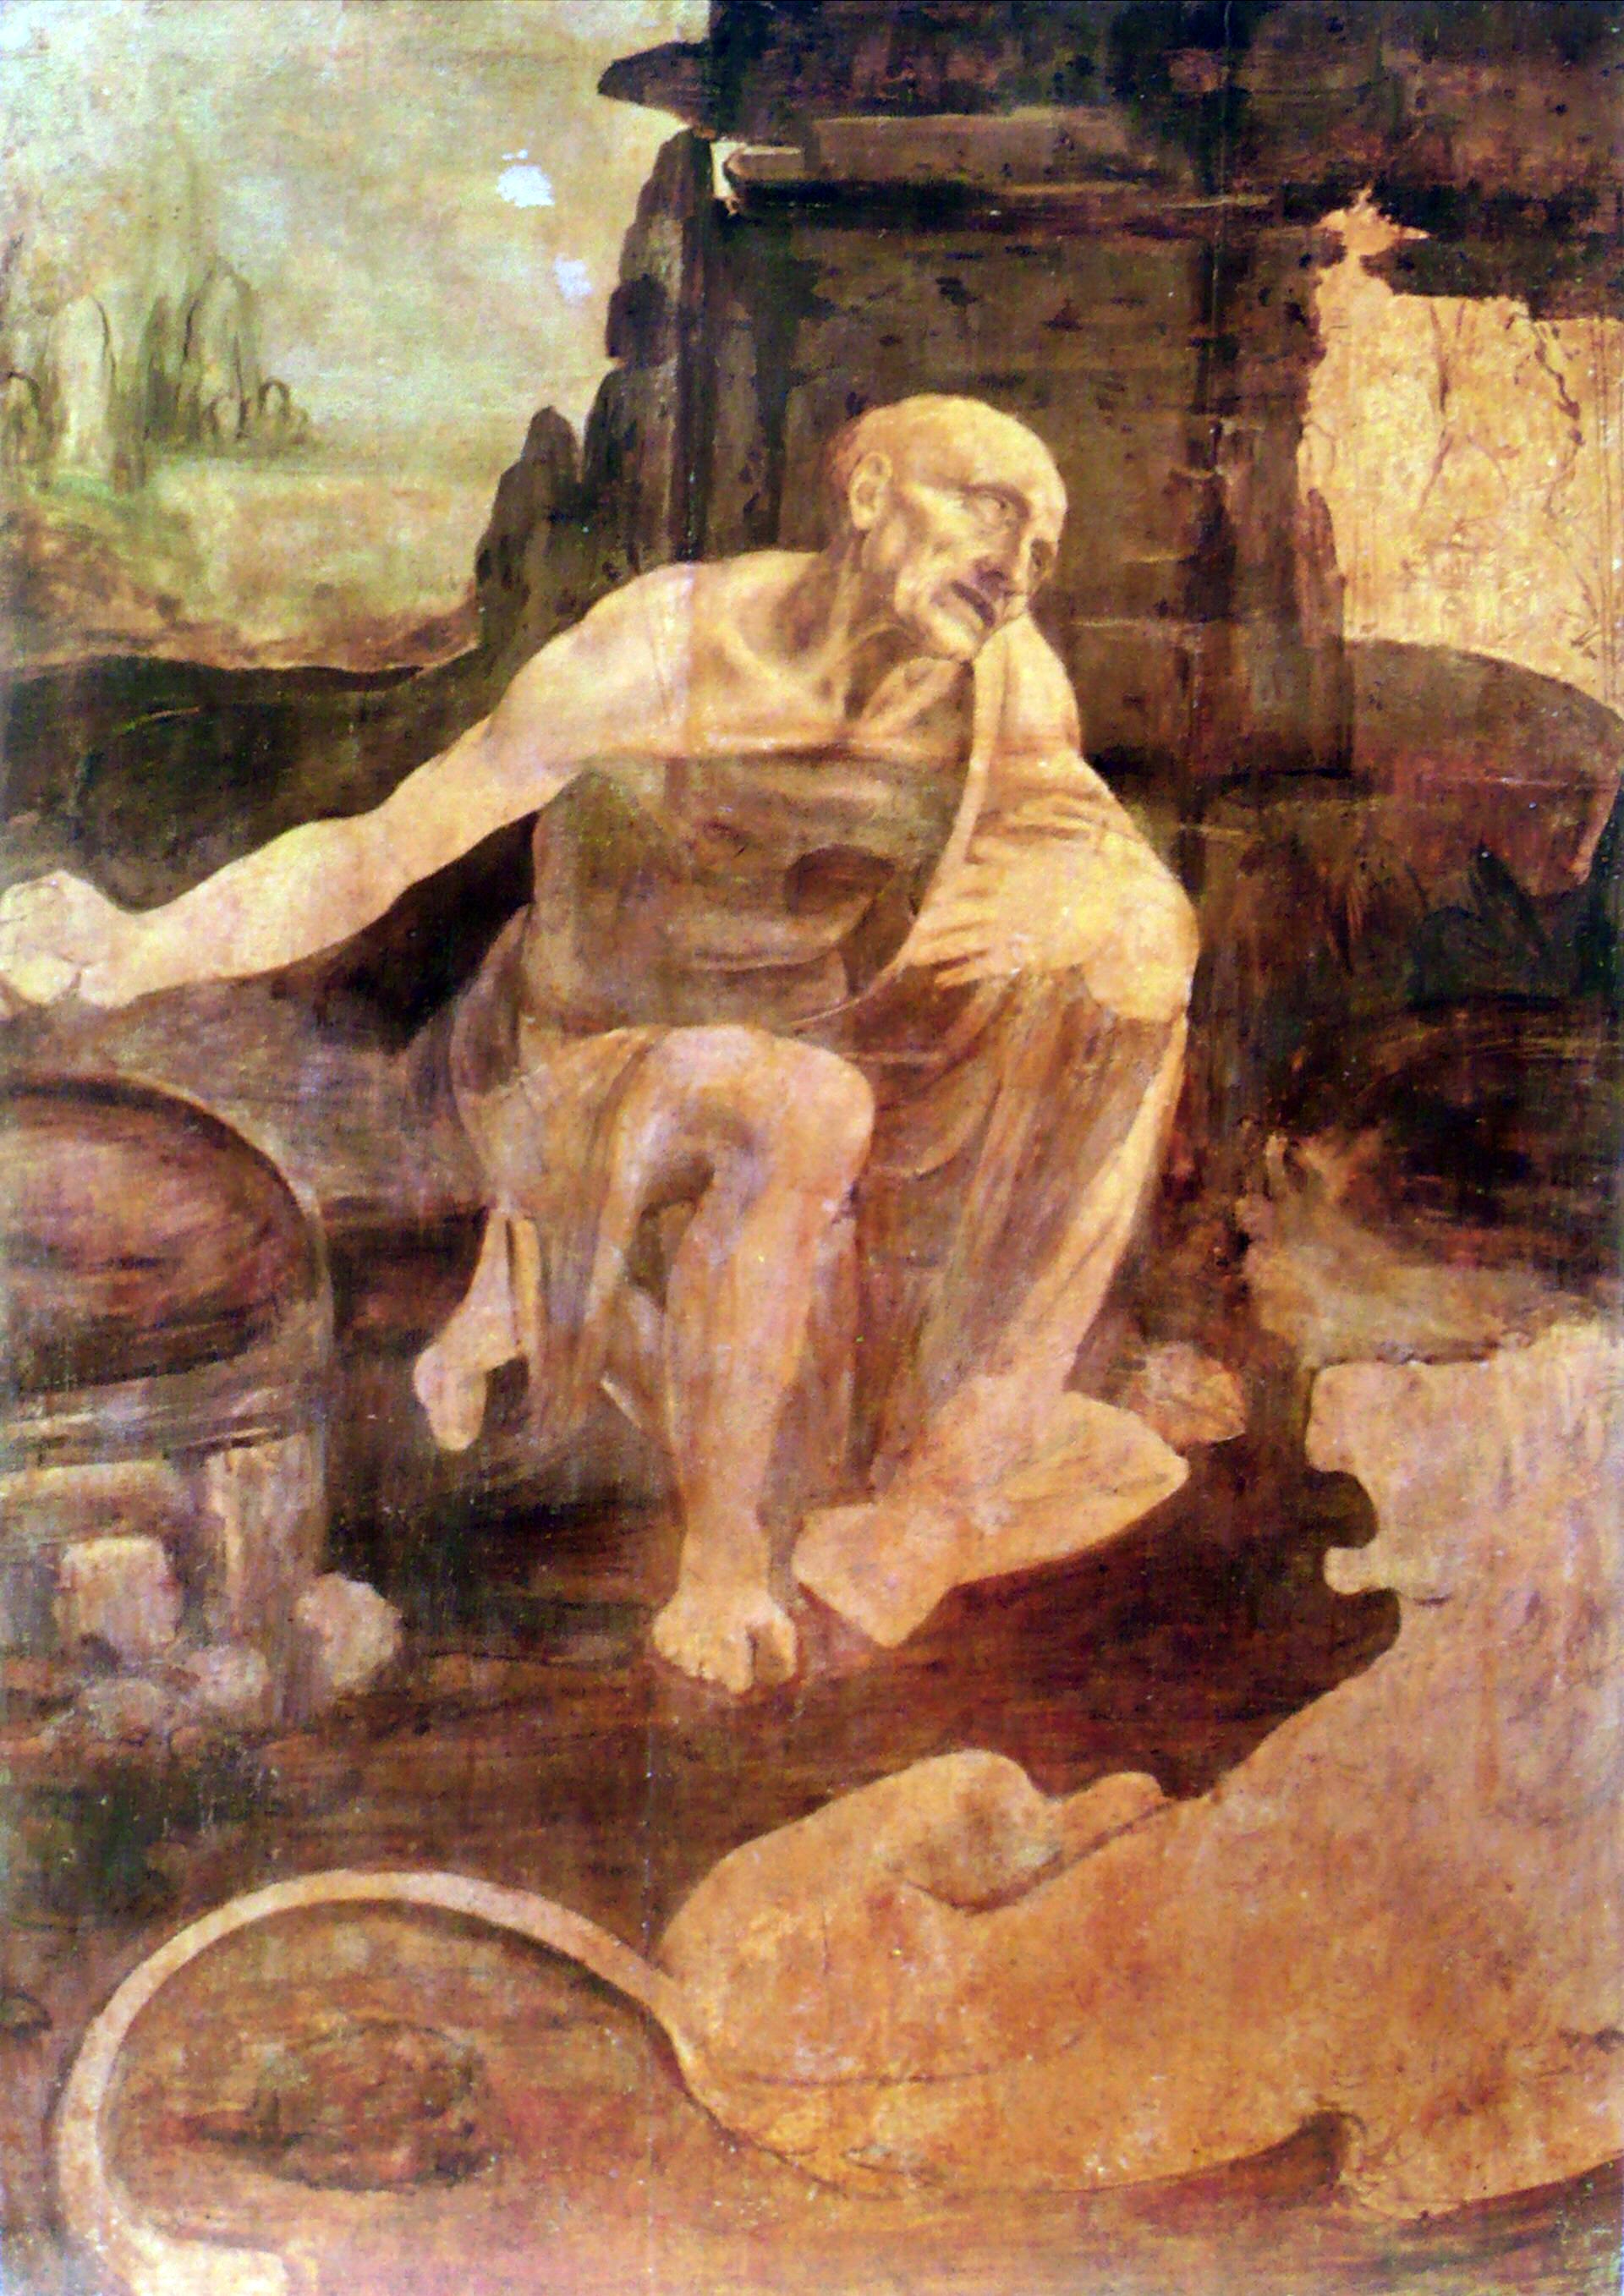 https://upload.wikimedia.org/wikipedia/commons/archive/9/98/20100609161628%21Leonardo_da_Vinci_-_Saint_Jerome.jpg